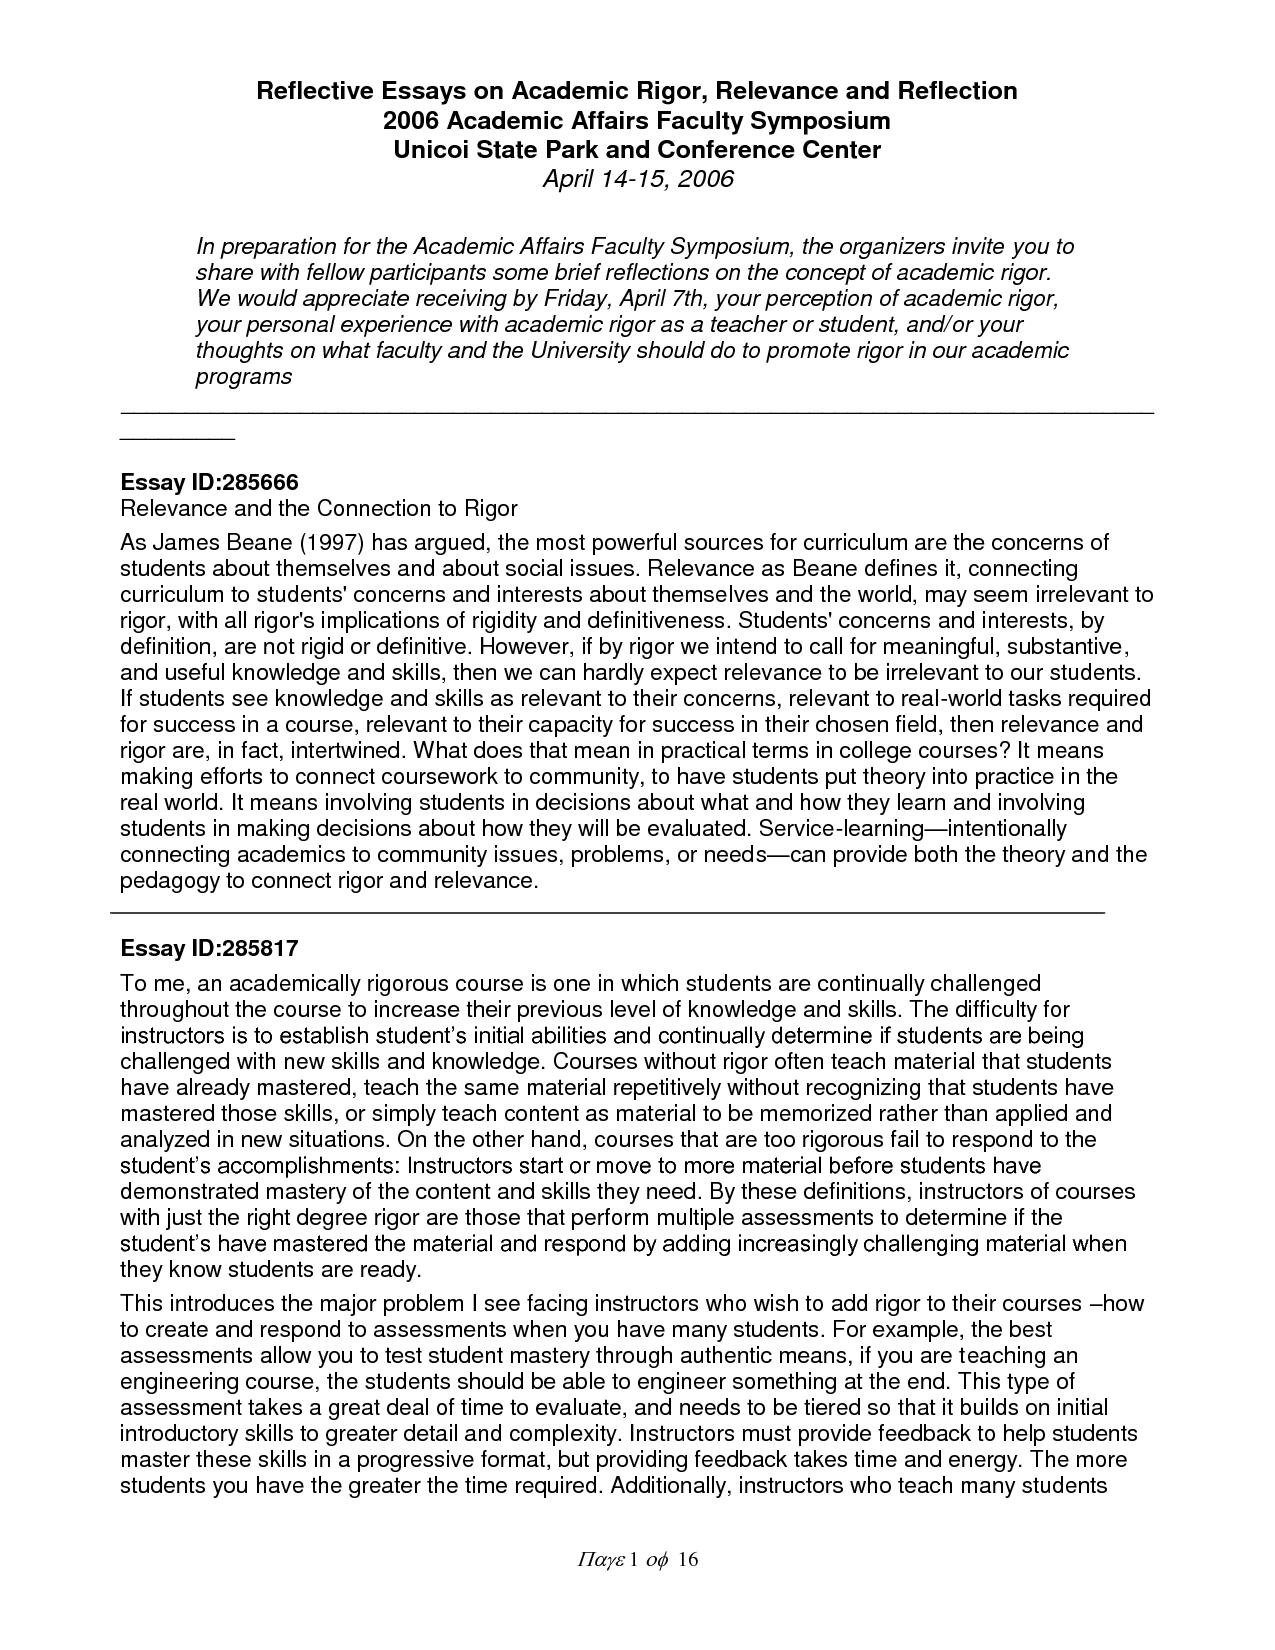 012 English Writing Sample Essays Essay Example Self Reflective Academic L Striking Creative Full